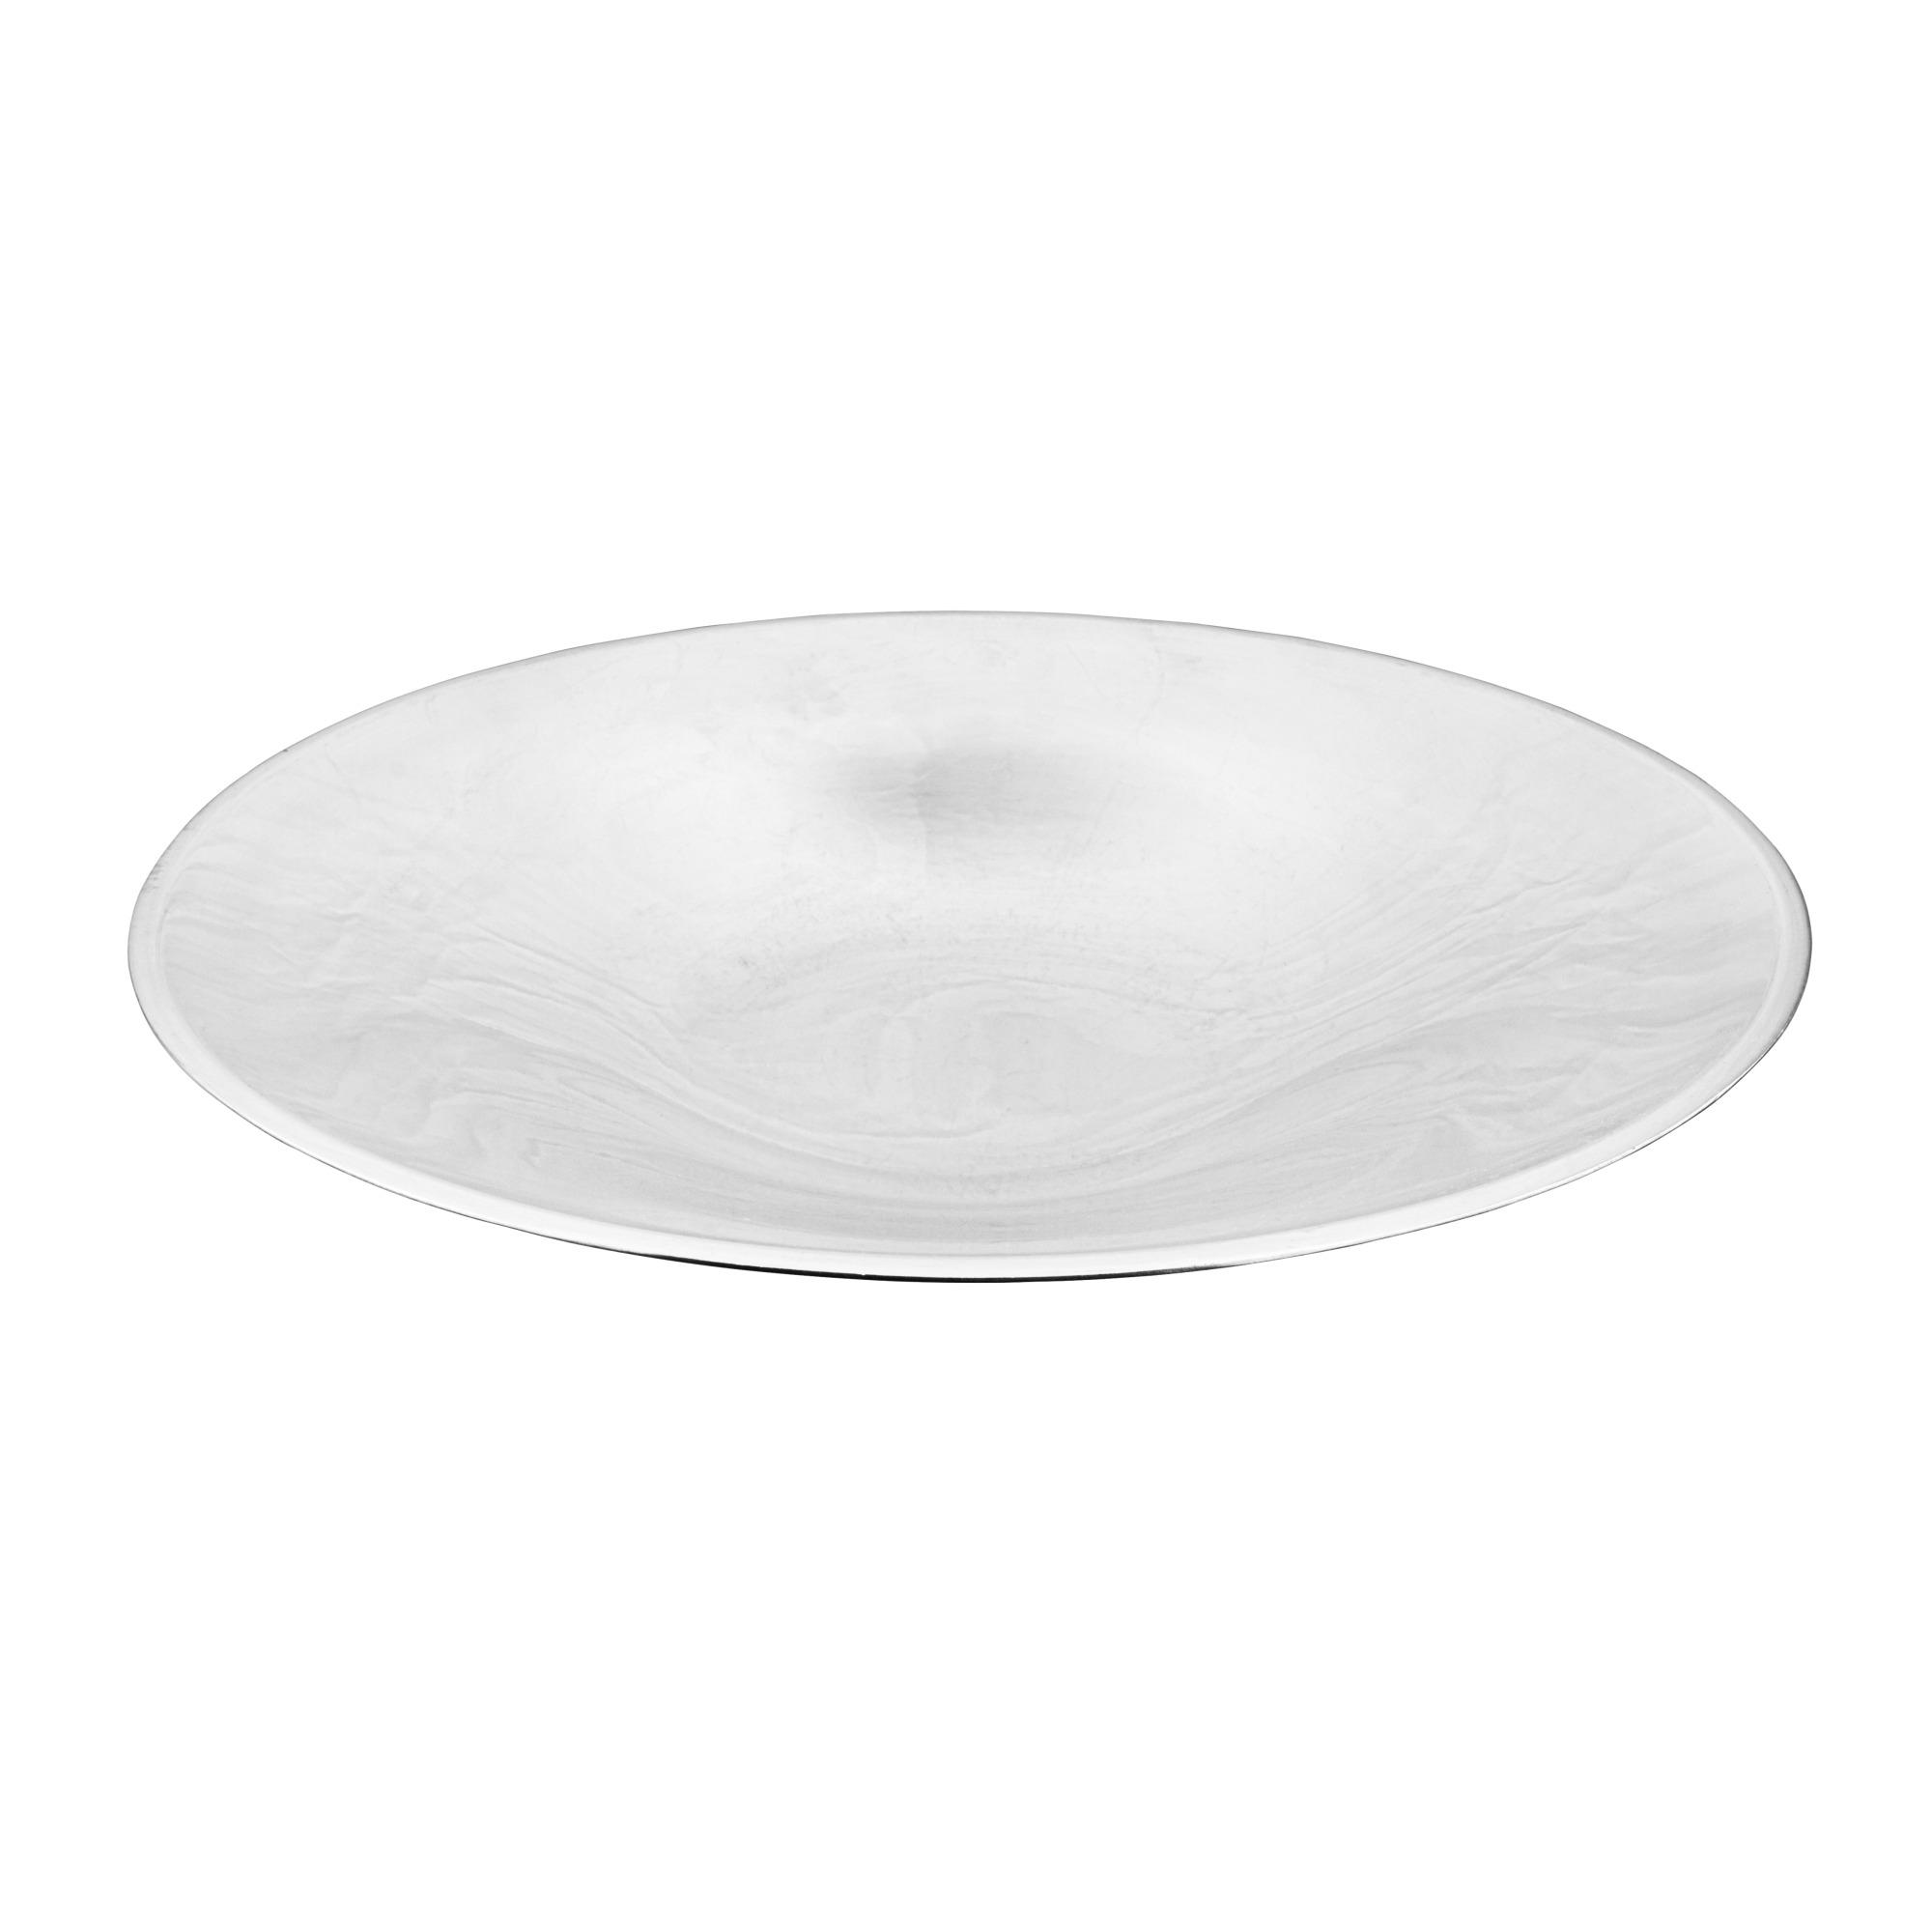 Saladeira Inox Conica 35cm - Meta Inox